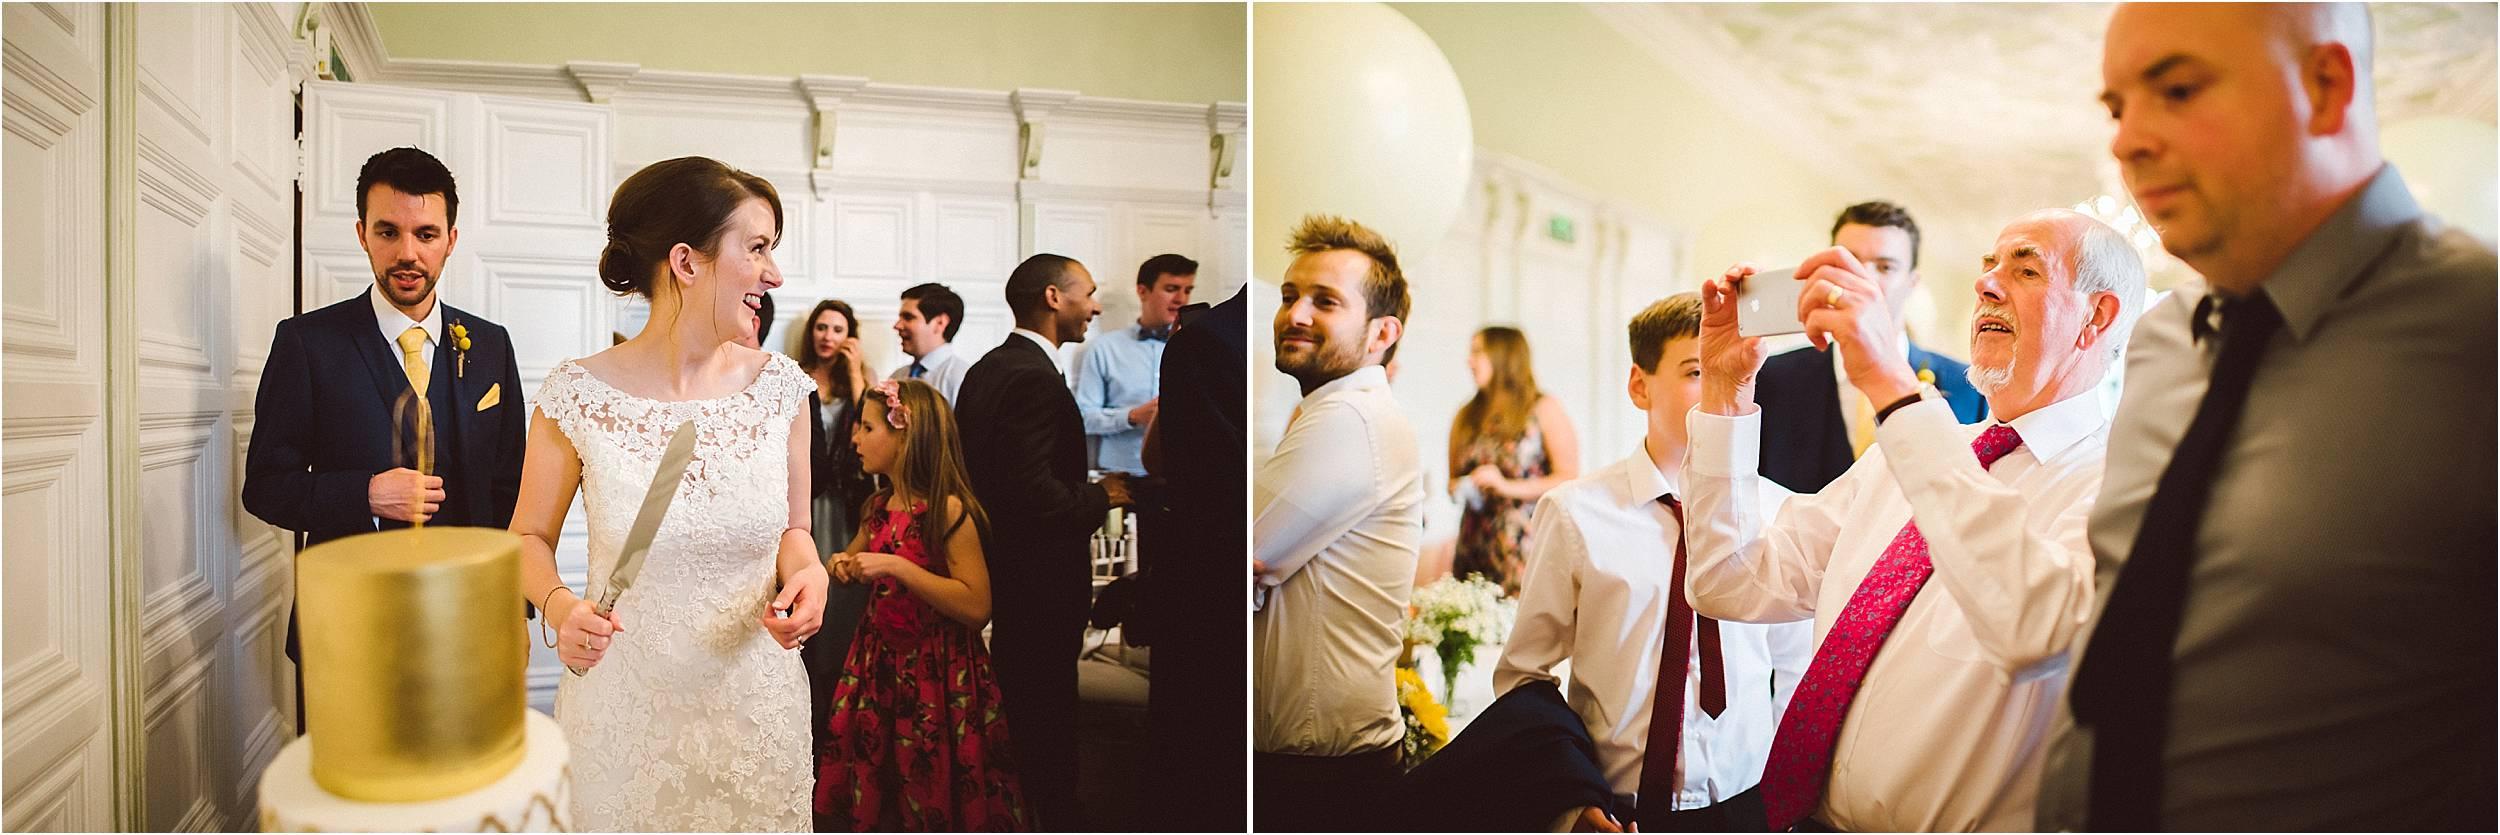 Hengrave Hall Wedding Photographer_0198.jpg